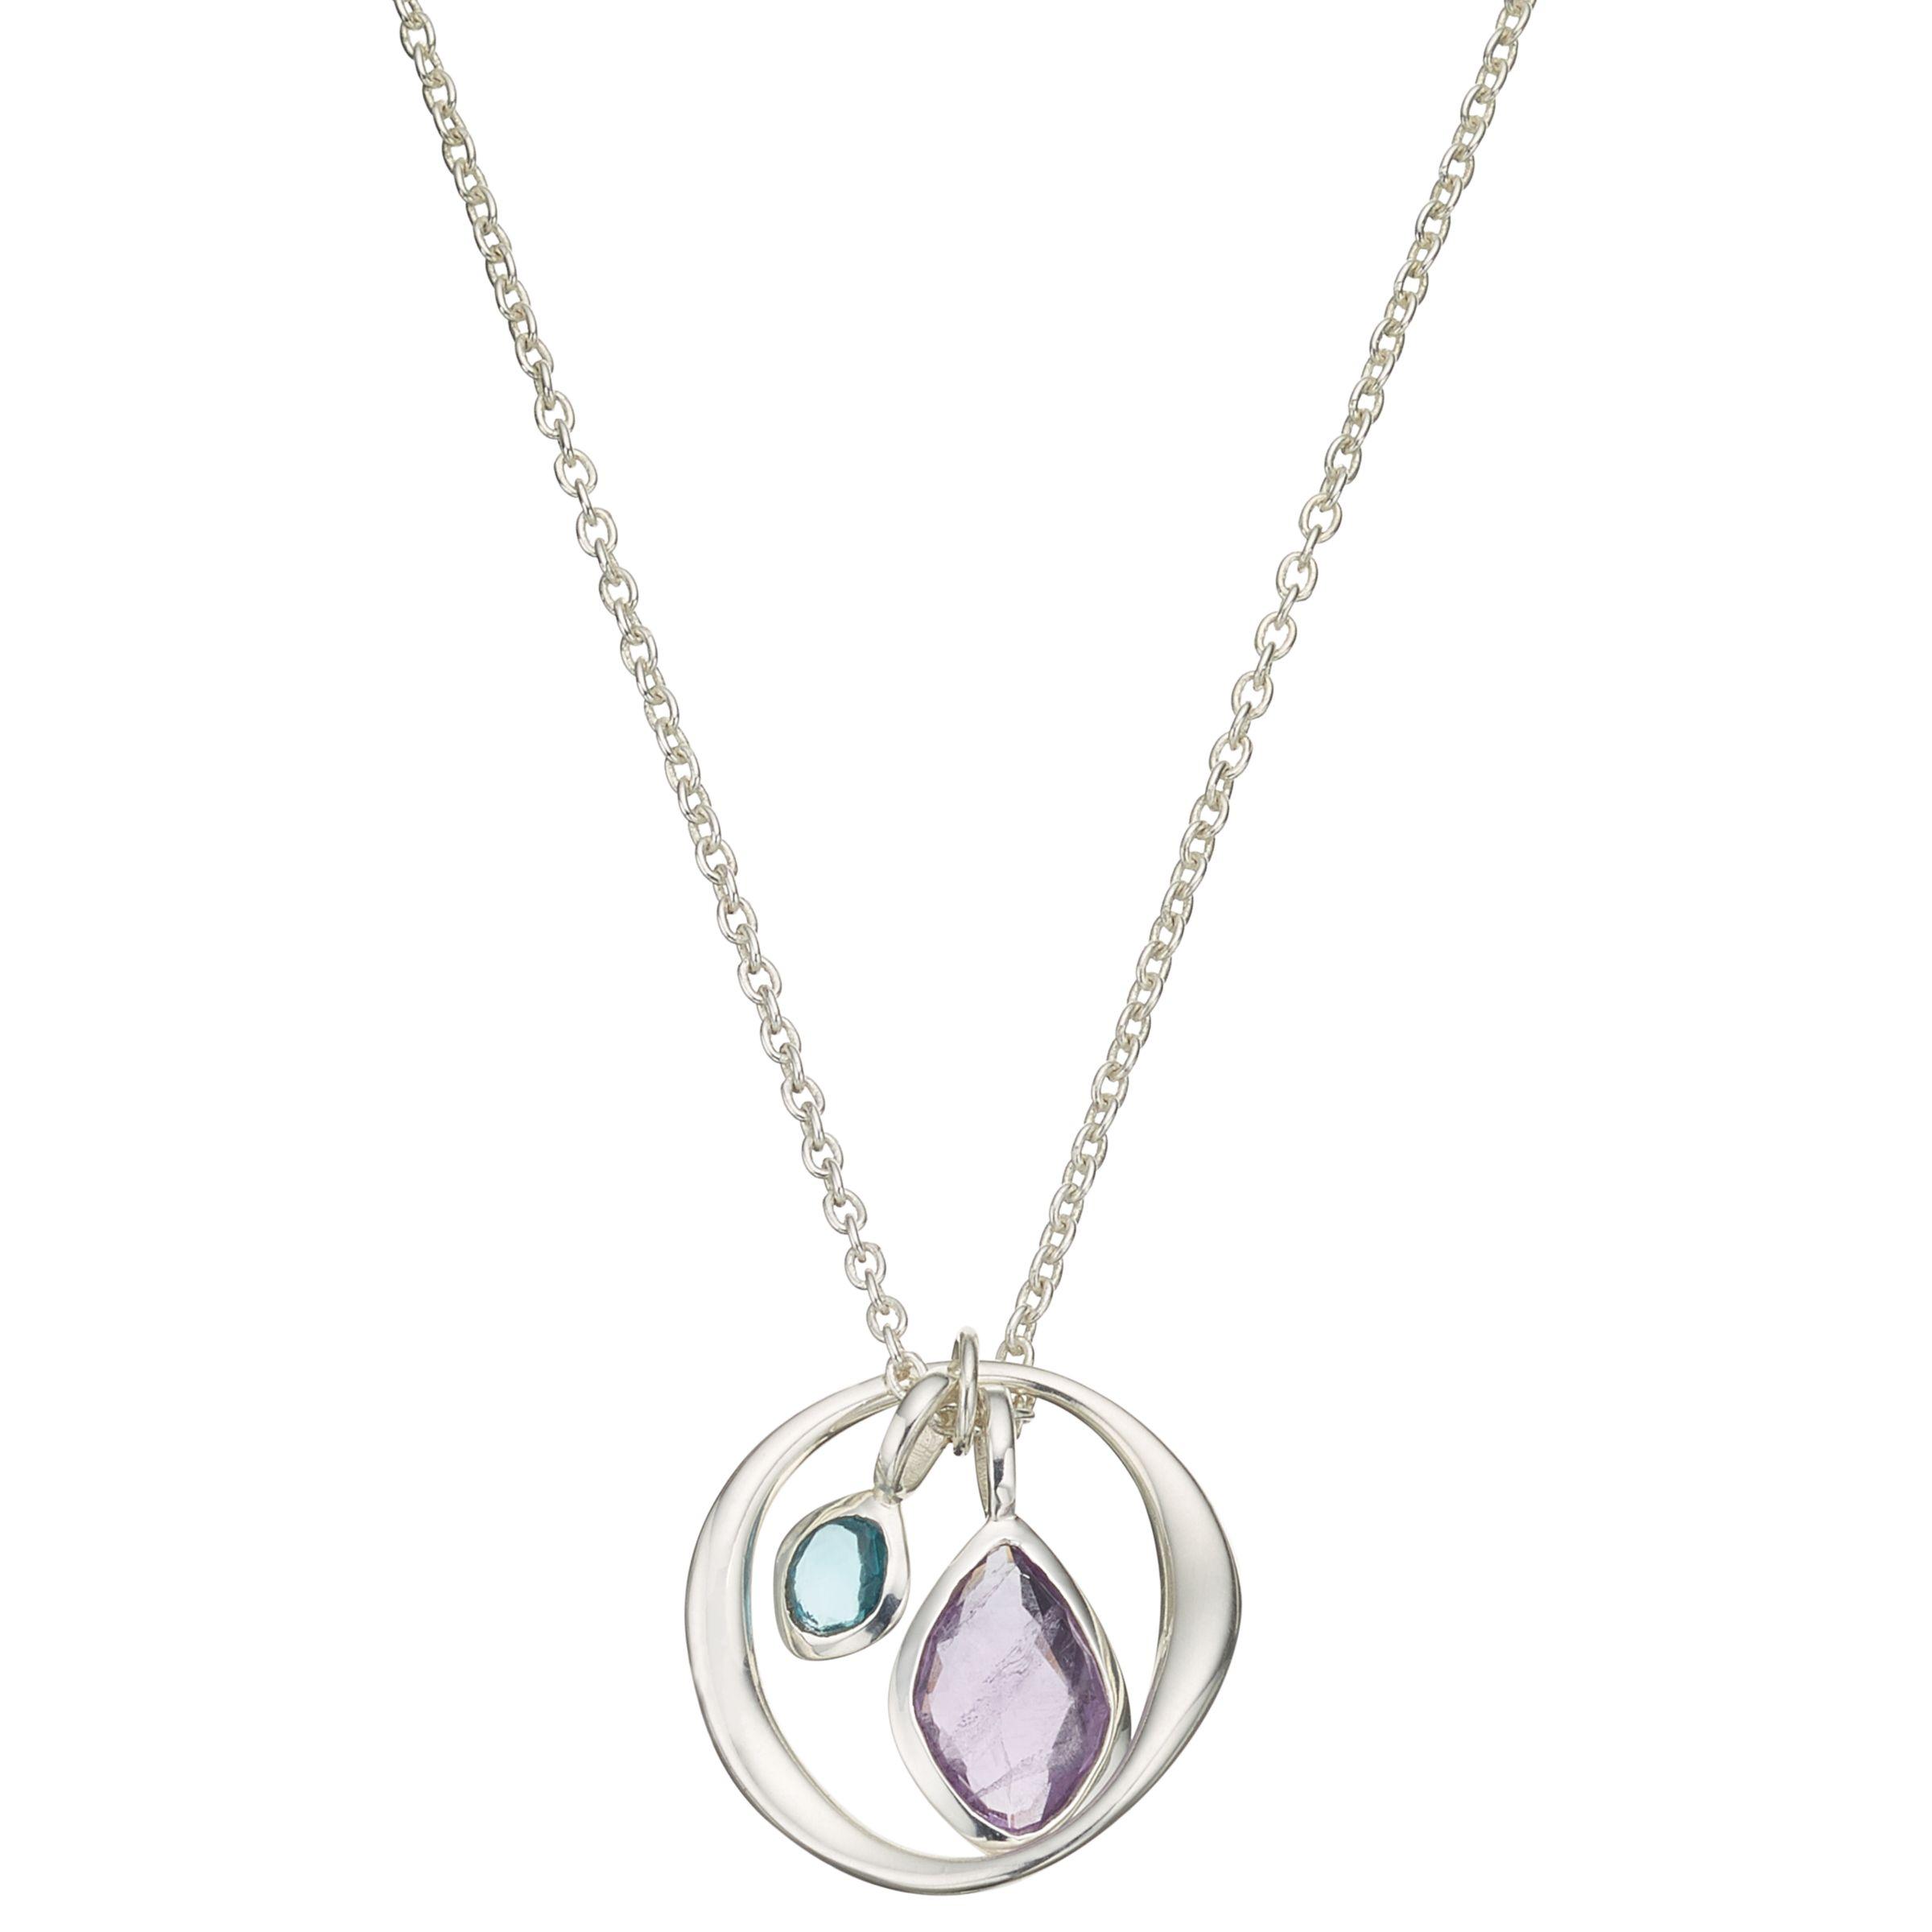 John Lewis Gemstones John Lewis Gemstones Open Circle Gemstone Pendant Necklace, Silver/Multi